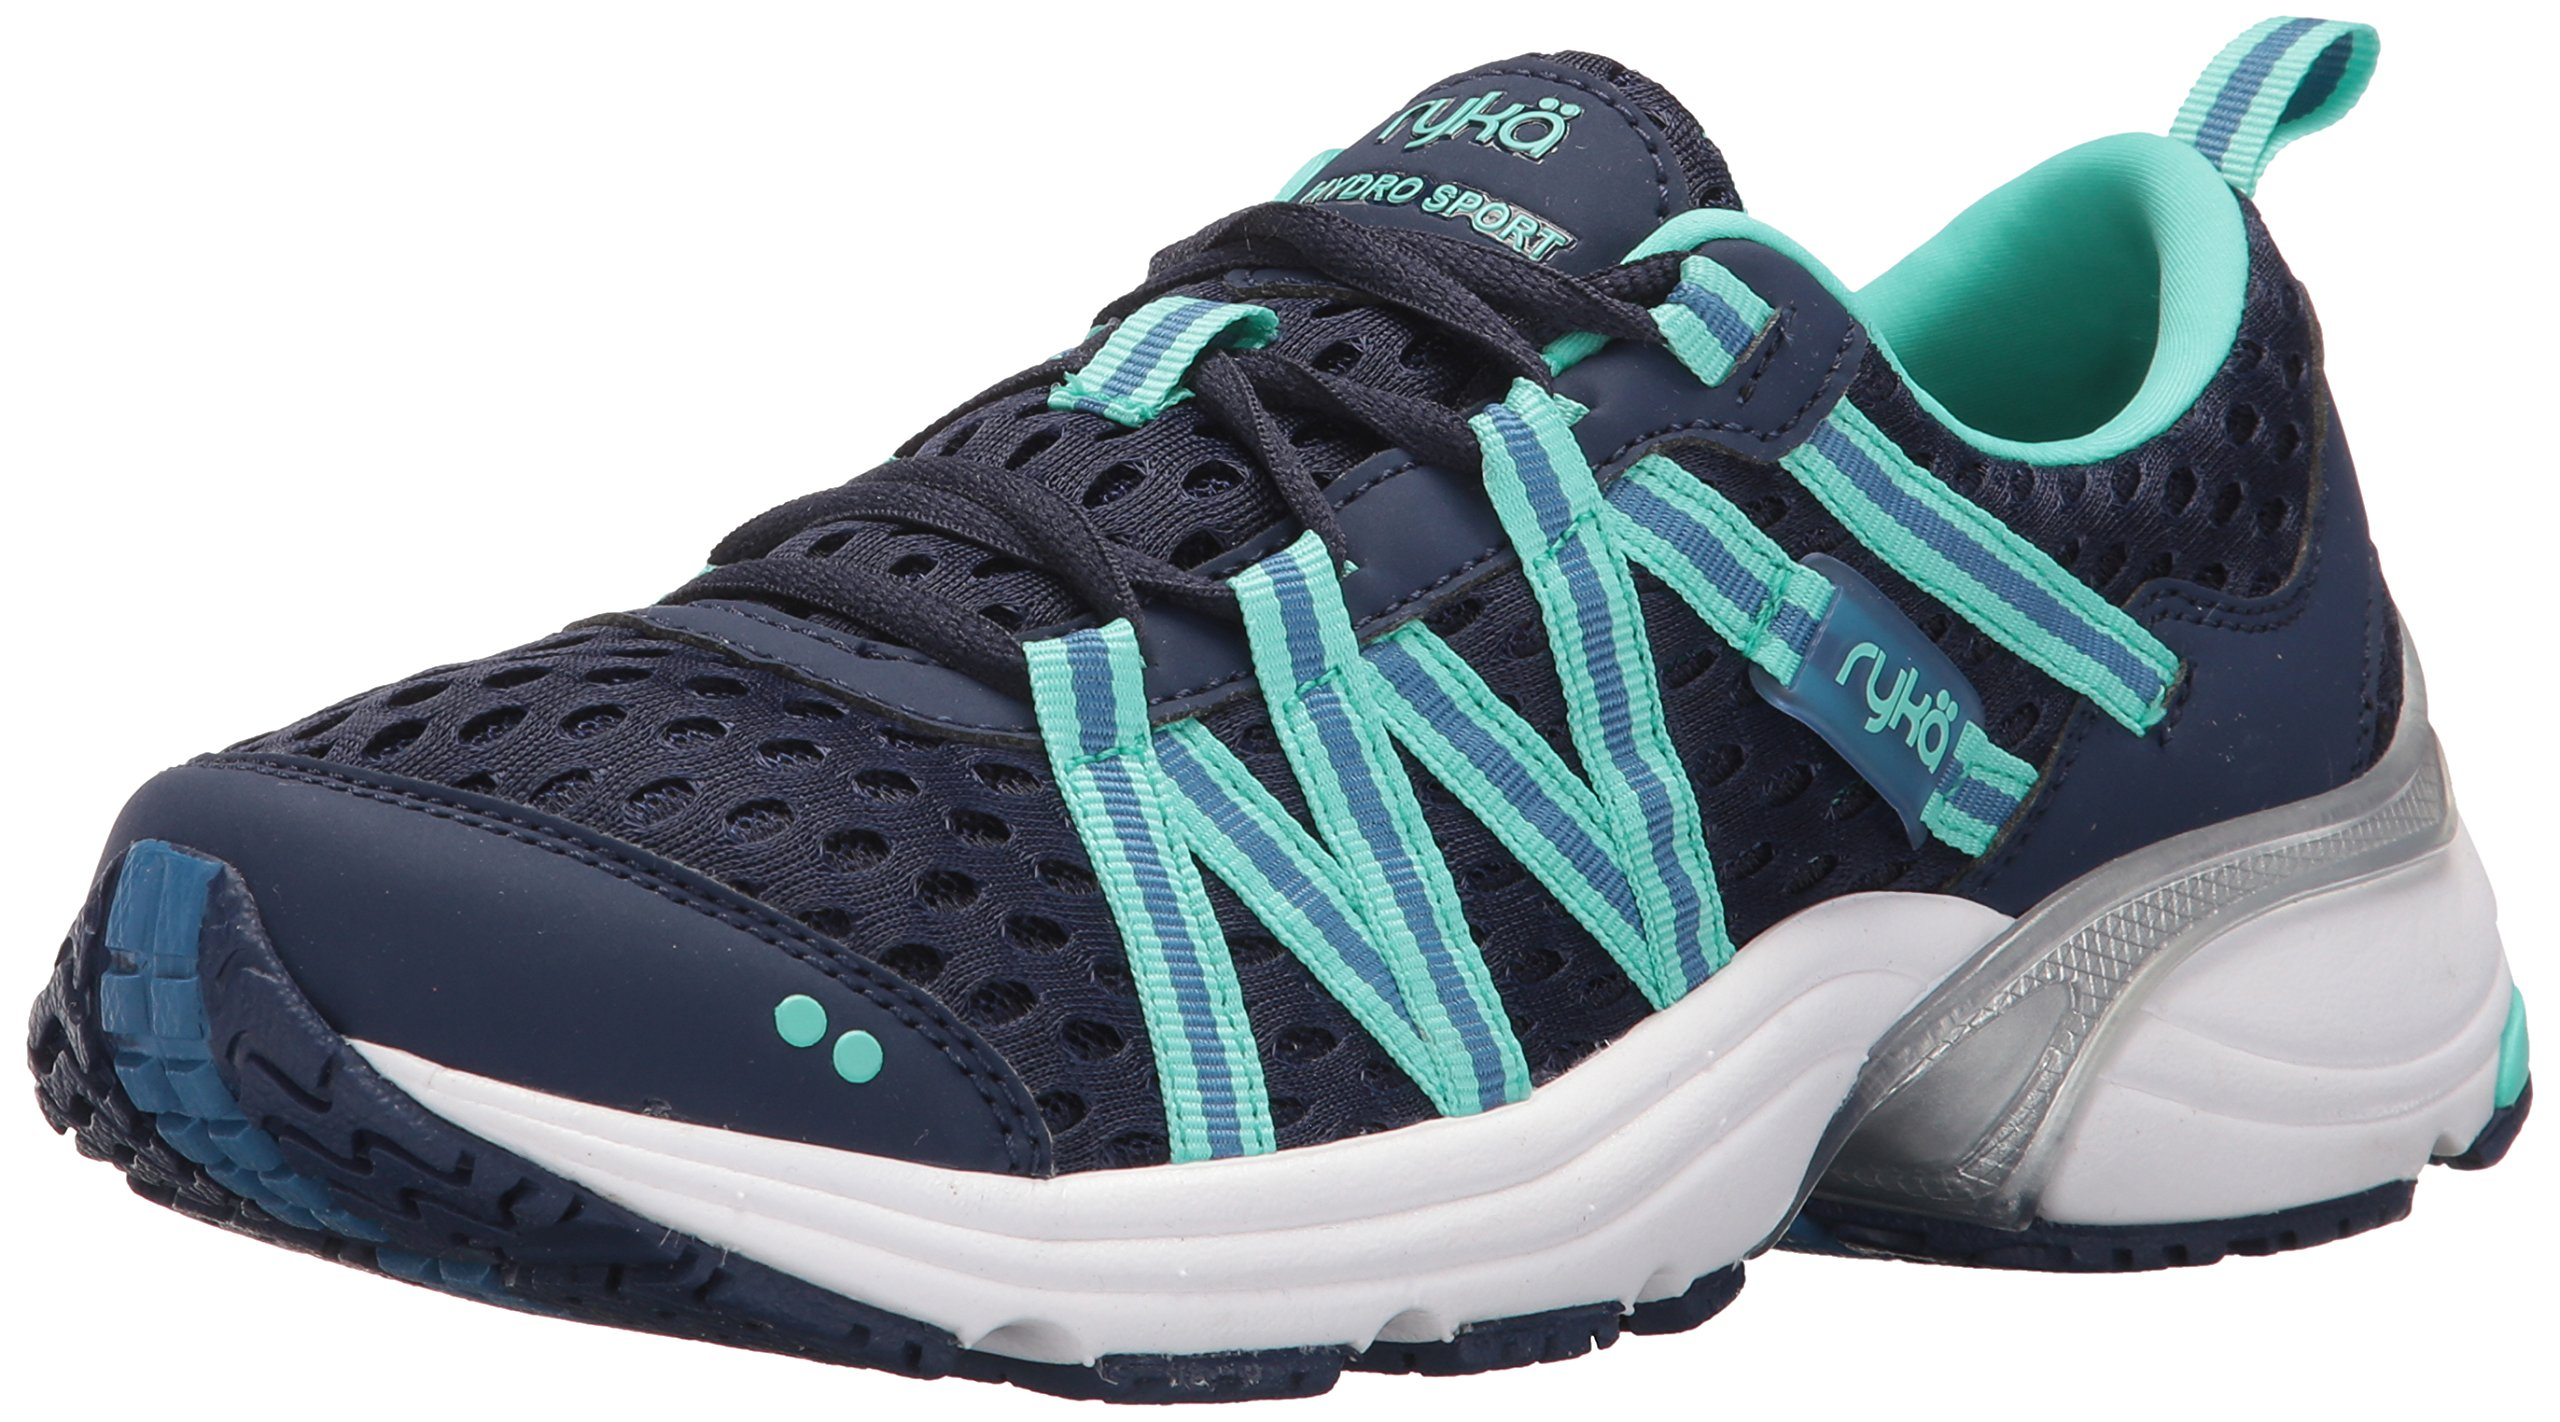 RYKA Women's Hydro Sport Water Shoe Cross Trainer, Blue/Teal, 5 M US Blue/Teal 5 M US